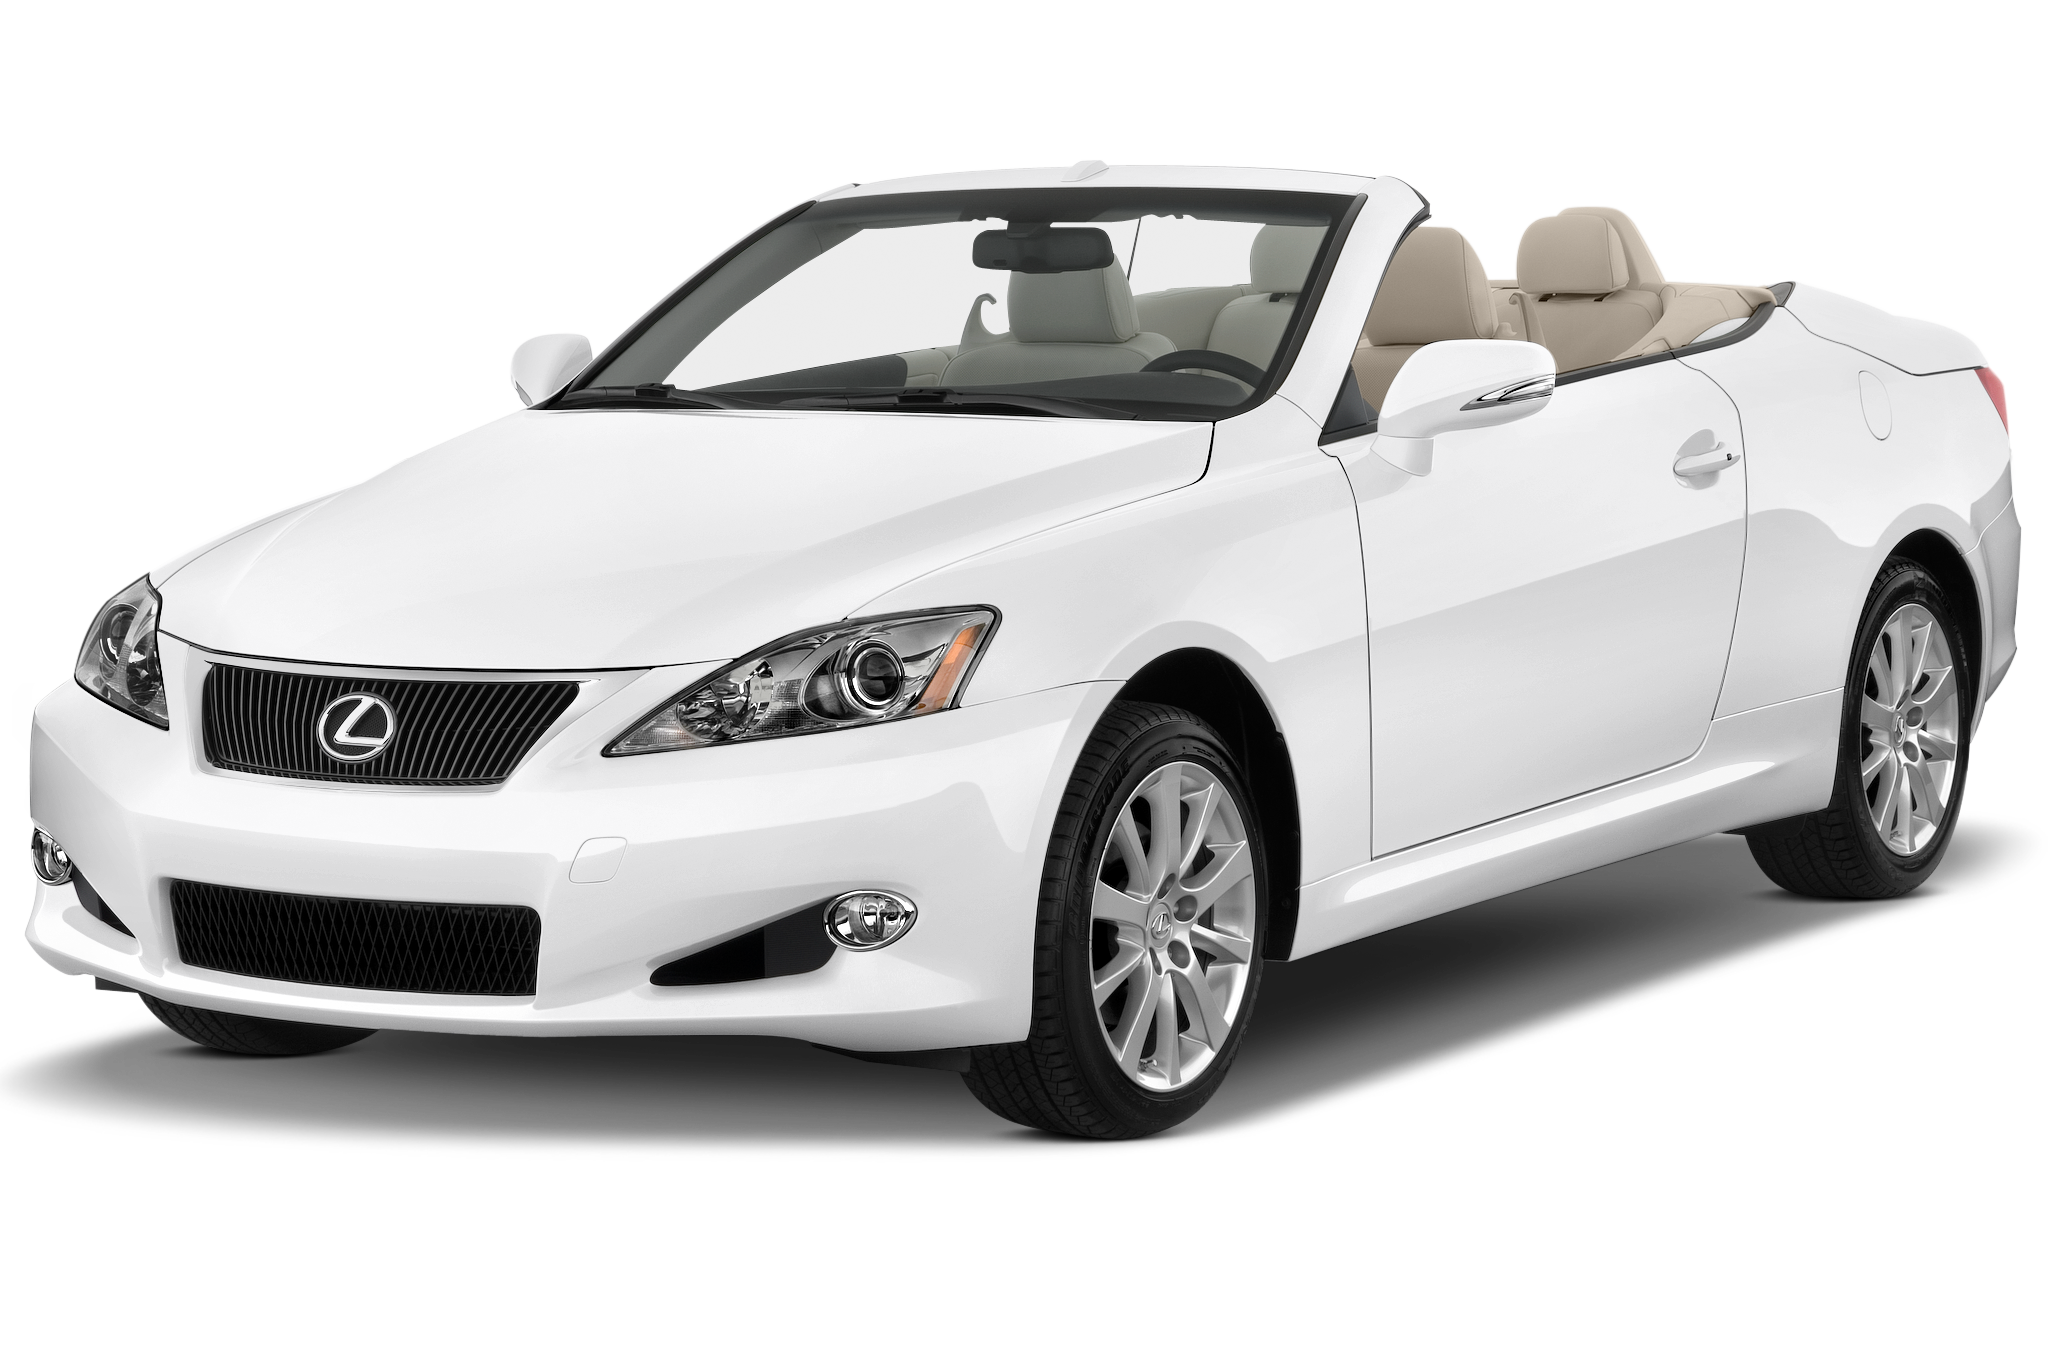 Lexus Png Image Purepng Free Transparent Cc0 Png Image Library